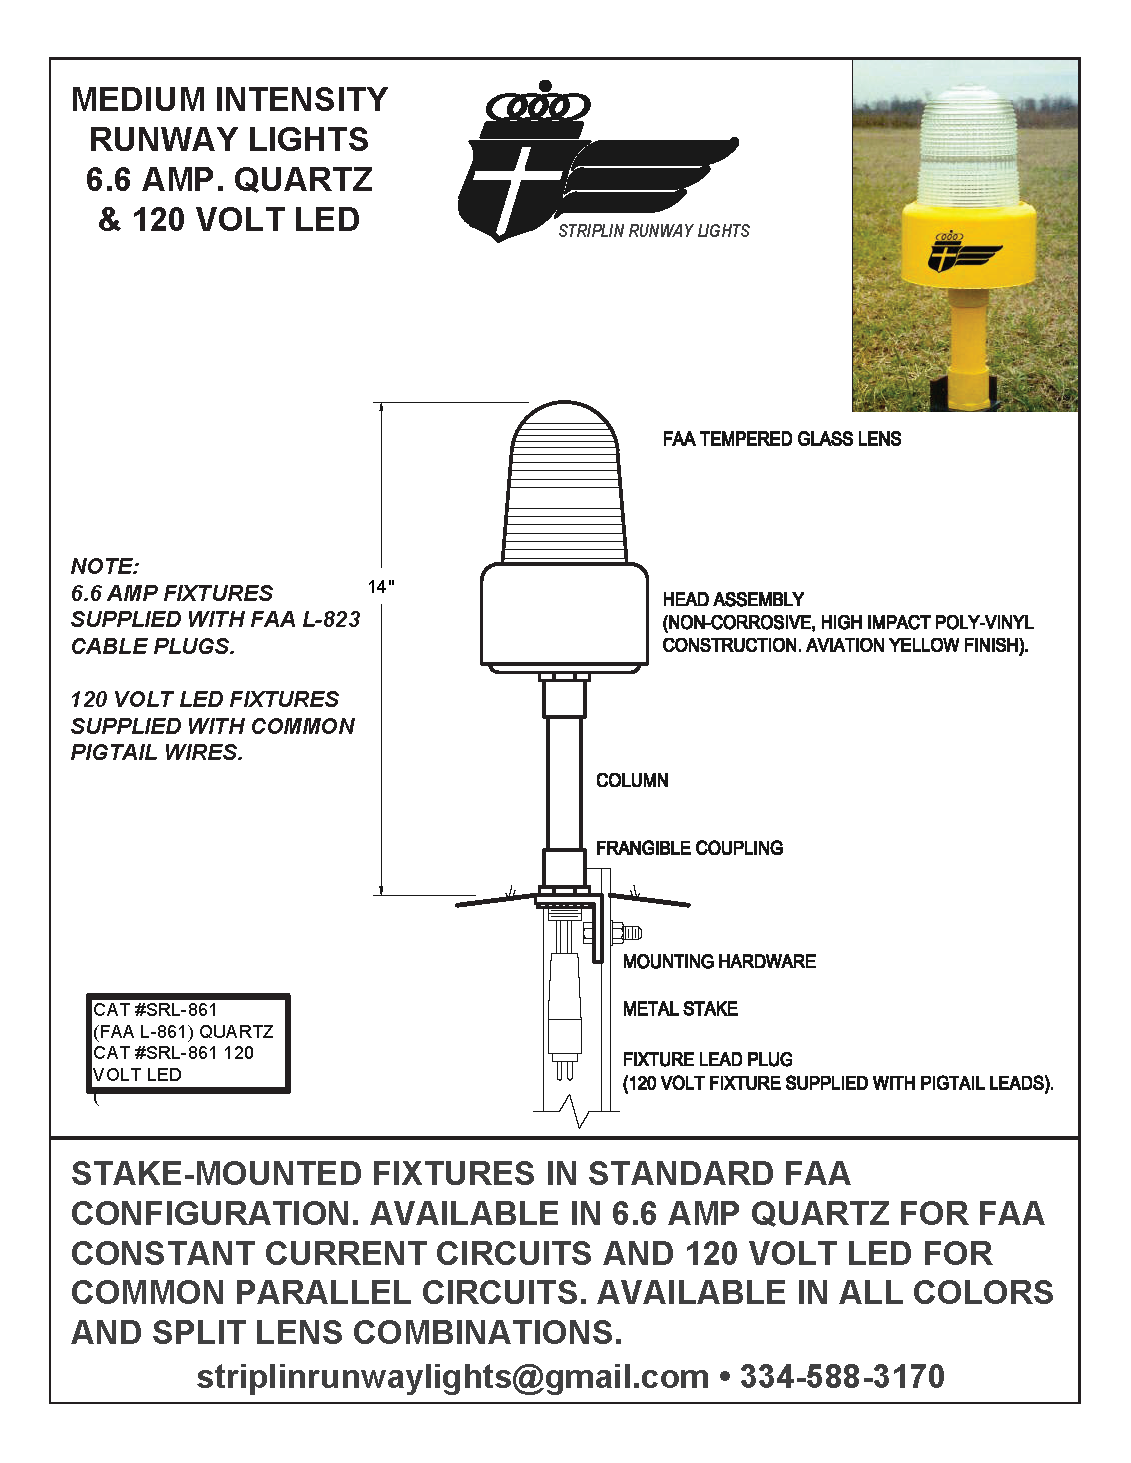 Medium Intensity Runway Lights: Airport Lighting Wiring Diagram At Aslink.org